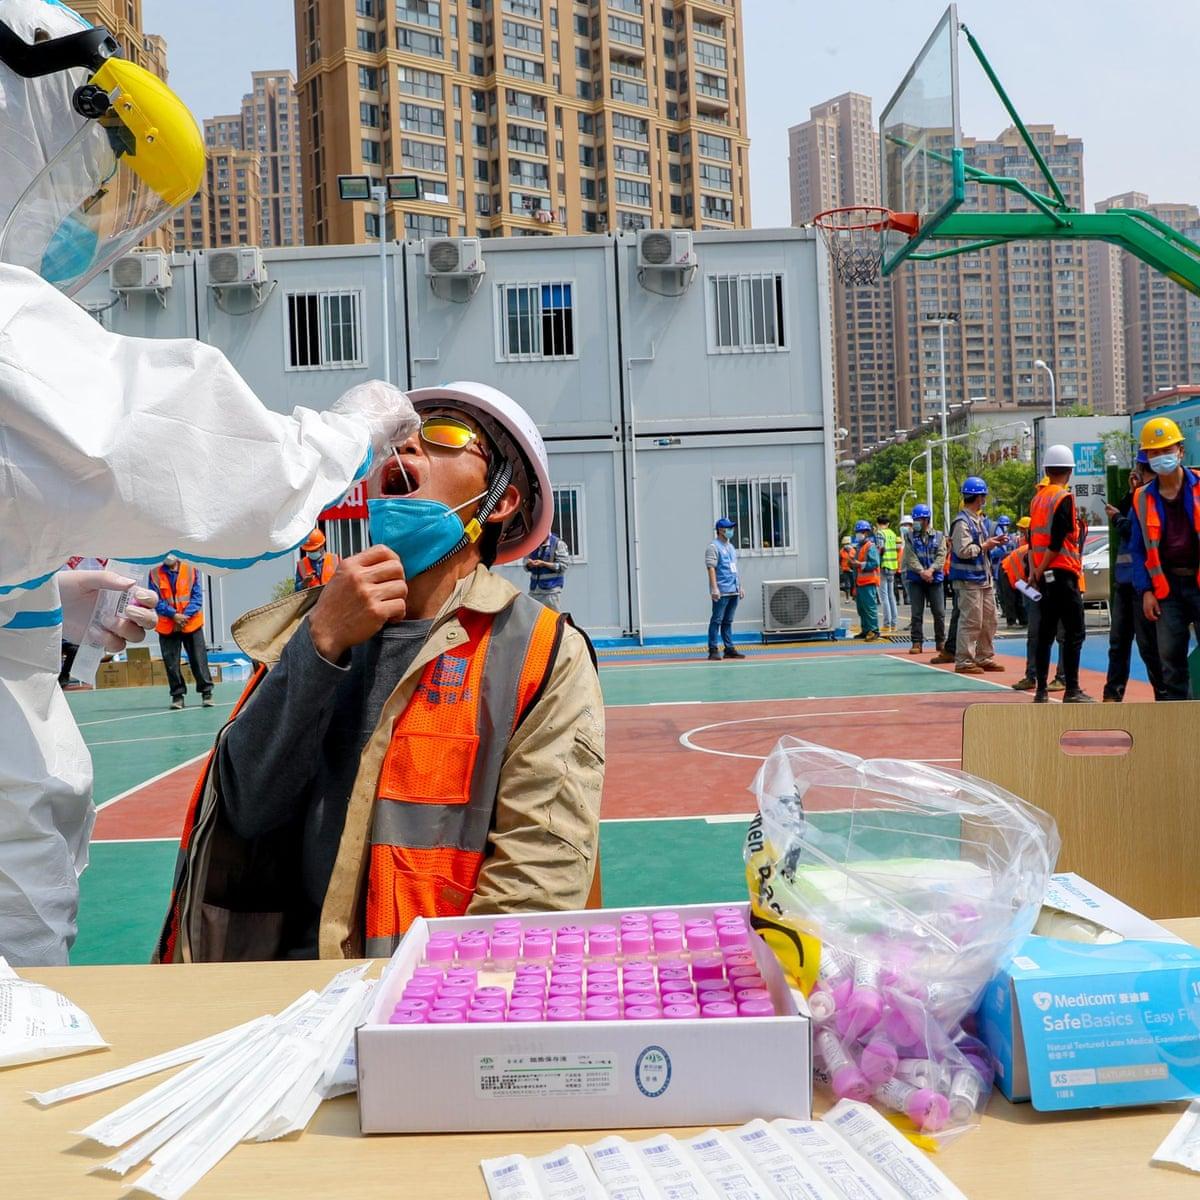 To Lift The Lockdown Britain Should Follow China S Example Coronavirus The Guardian